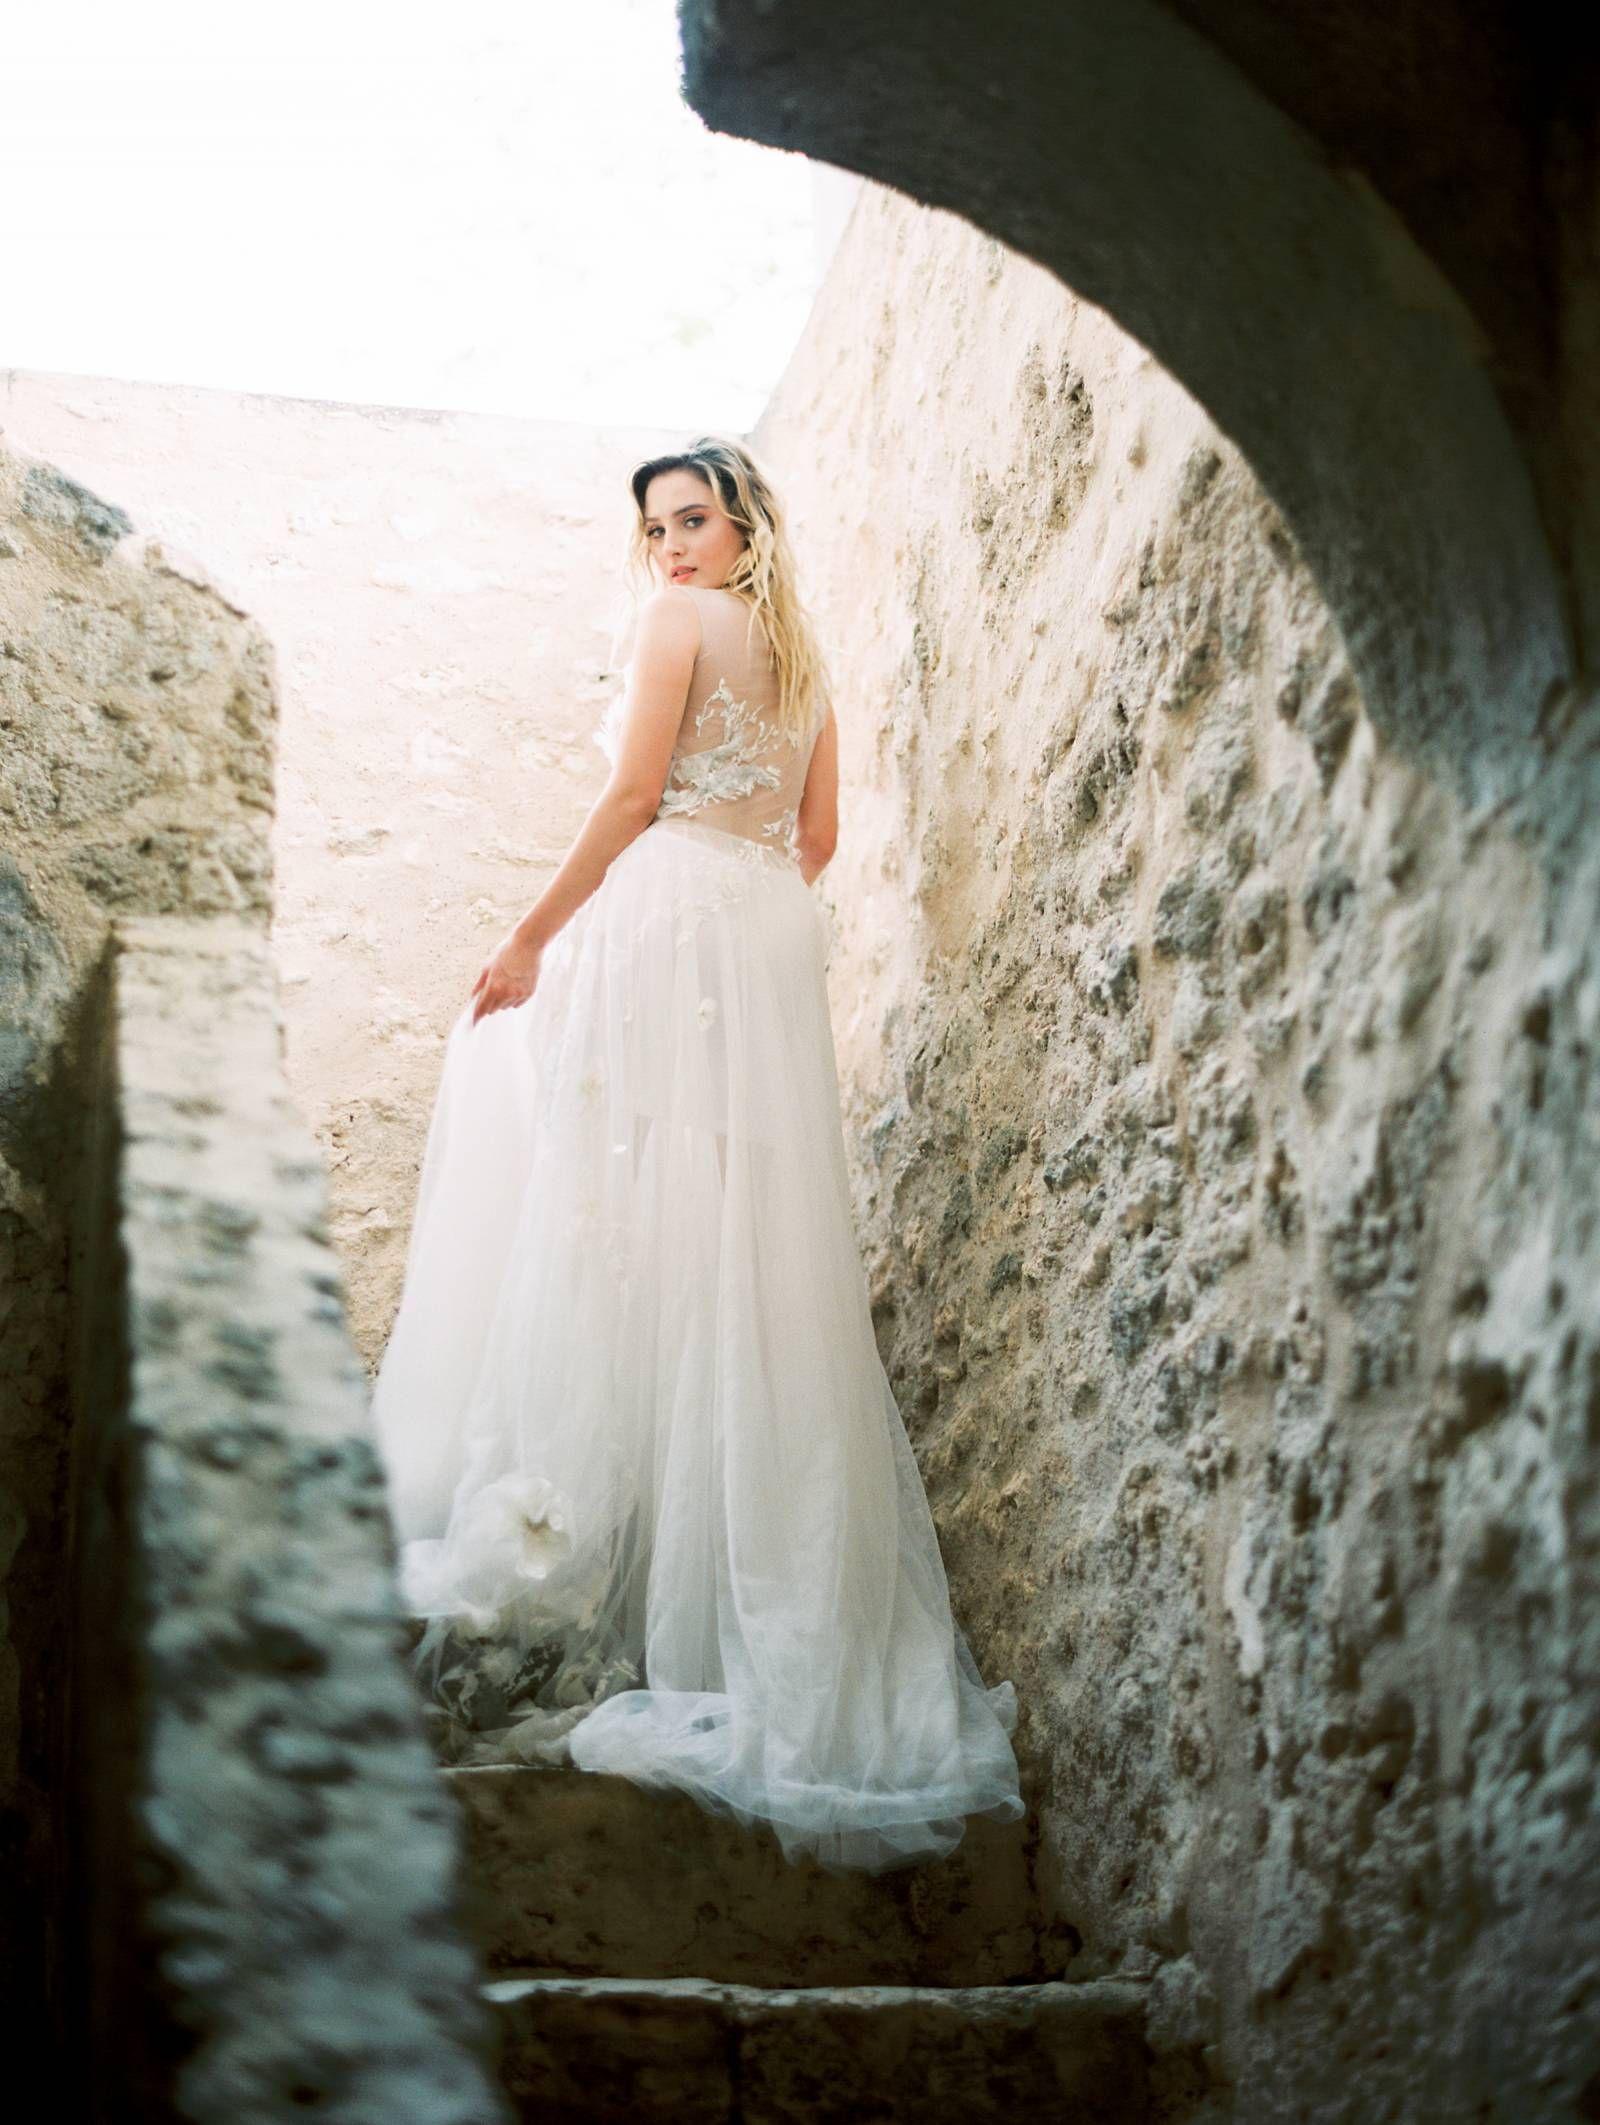 san antonio bridal shoot inspired by time-honoured